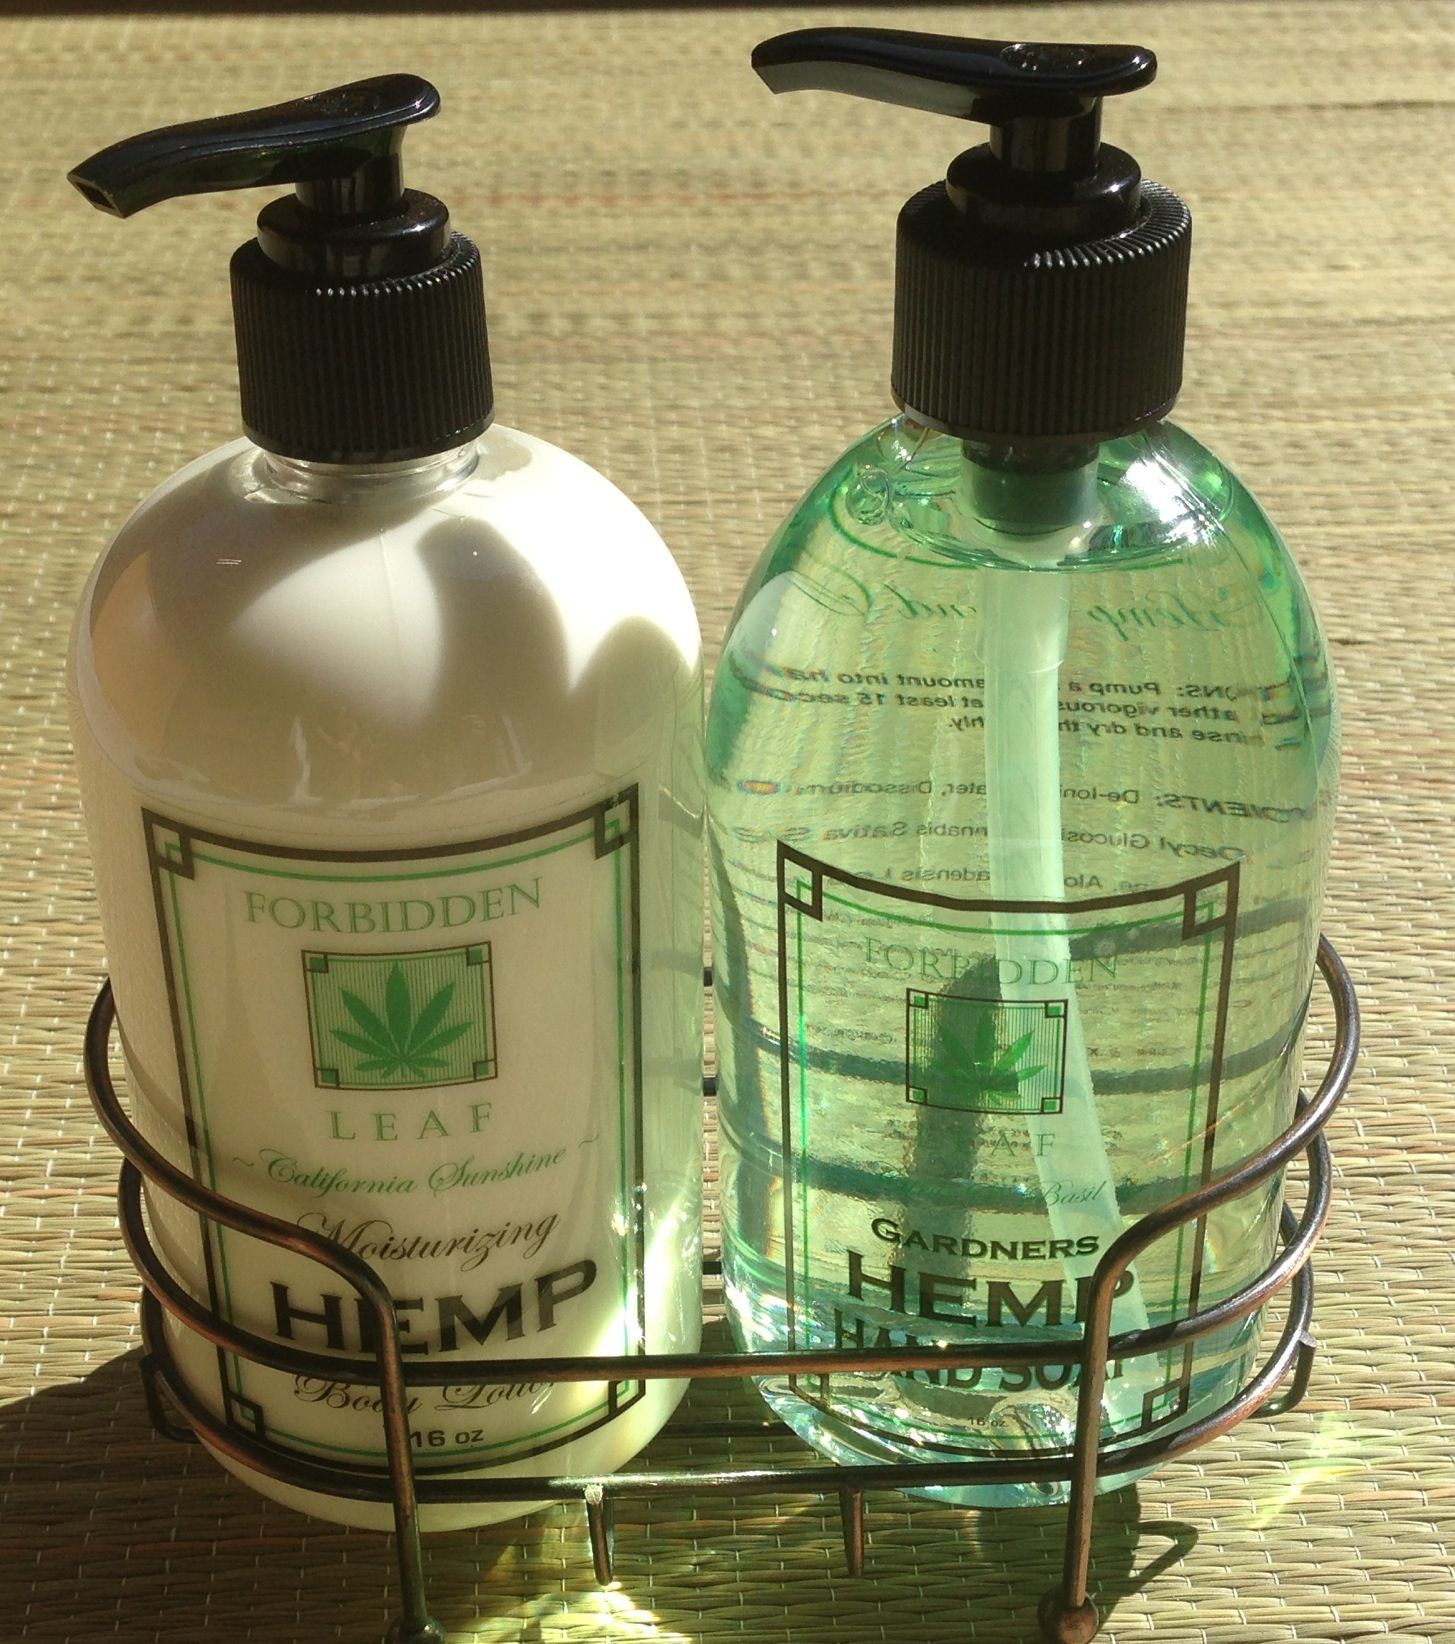 Forbidden Leaf Citrus/Basil Hemp Hand Wash & Hemp Lotion